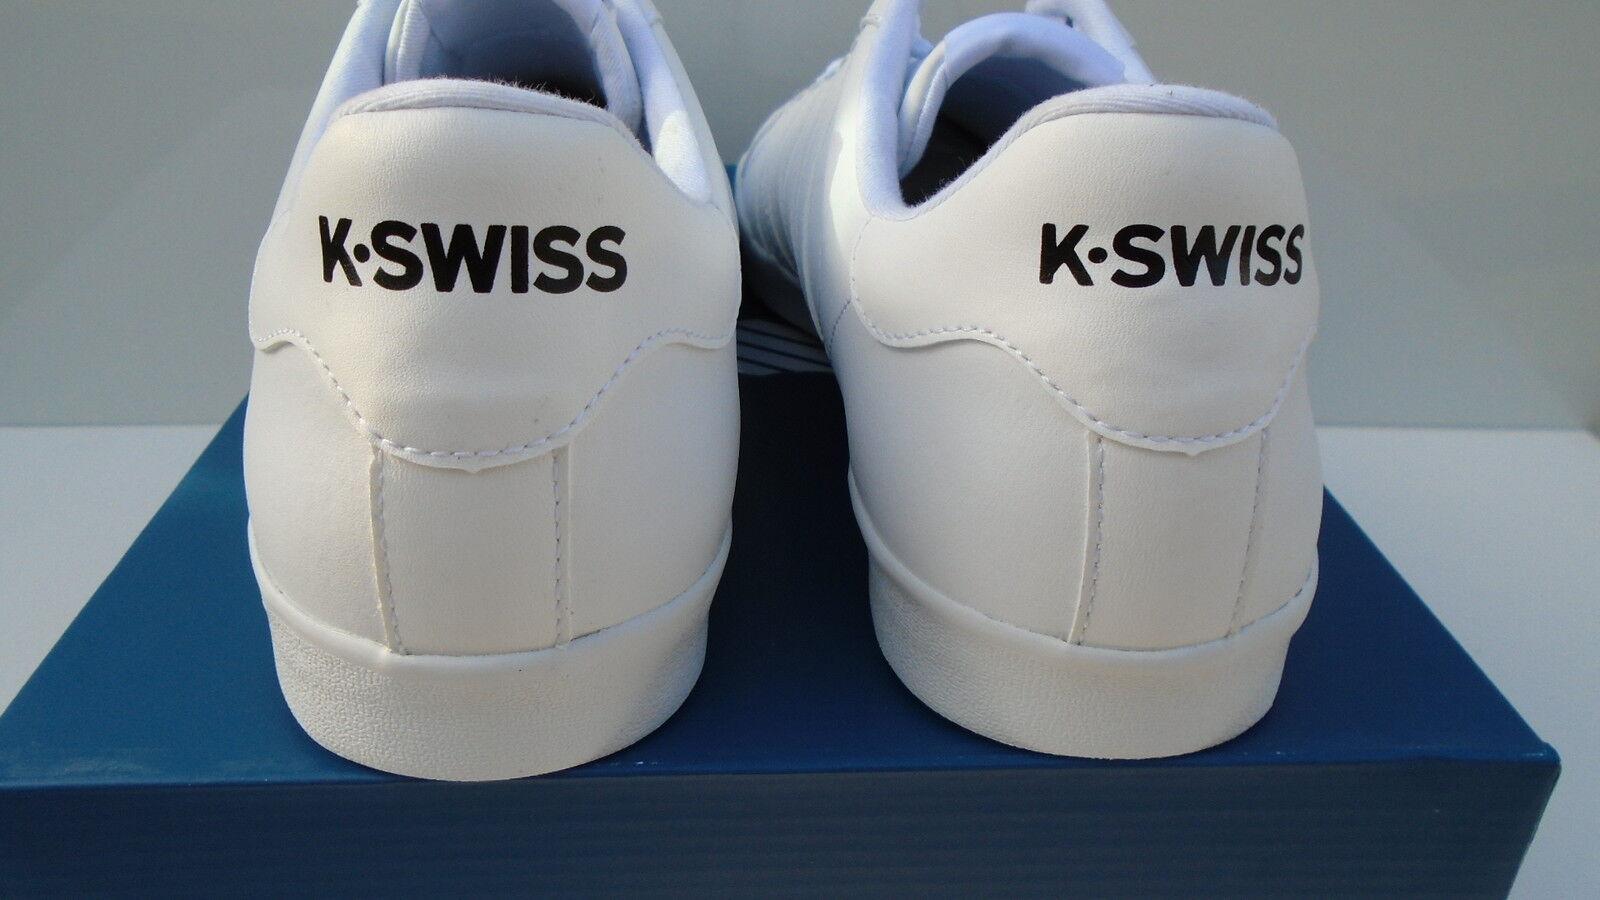 K-Swiss zapatos caballero blanco médico belmont cuero belmont médico cortos calzado deportivo 39 - 49 nuevo 8eba40